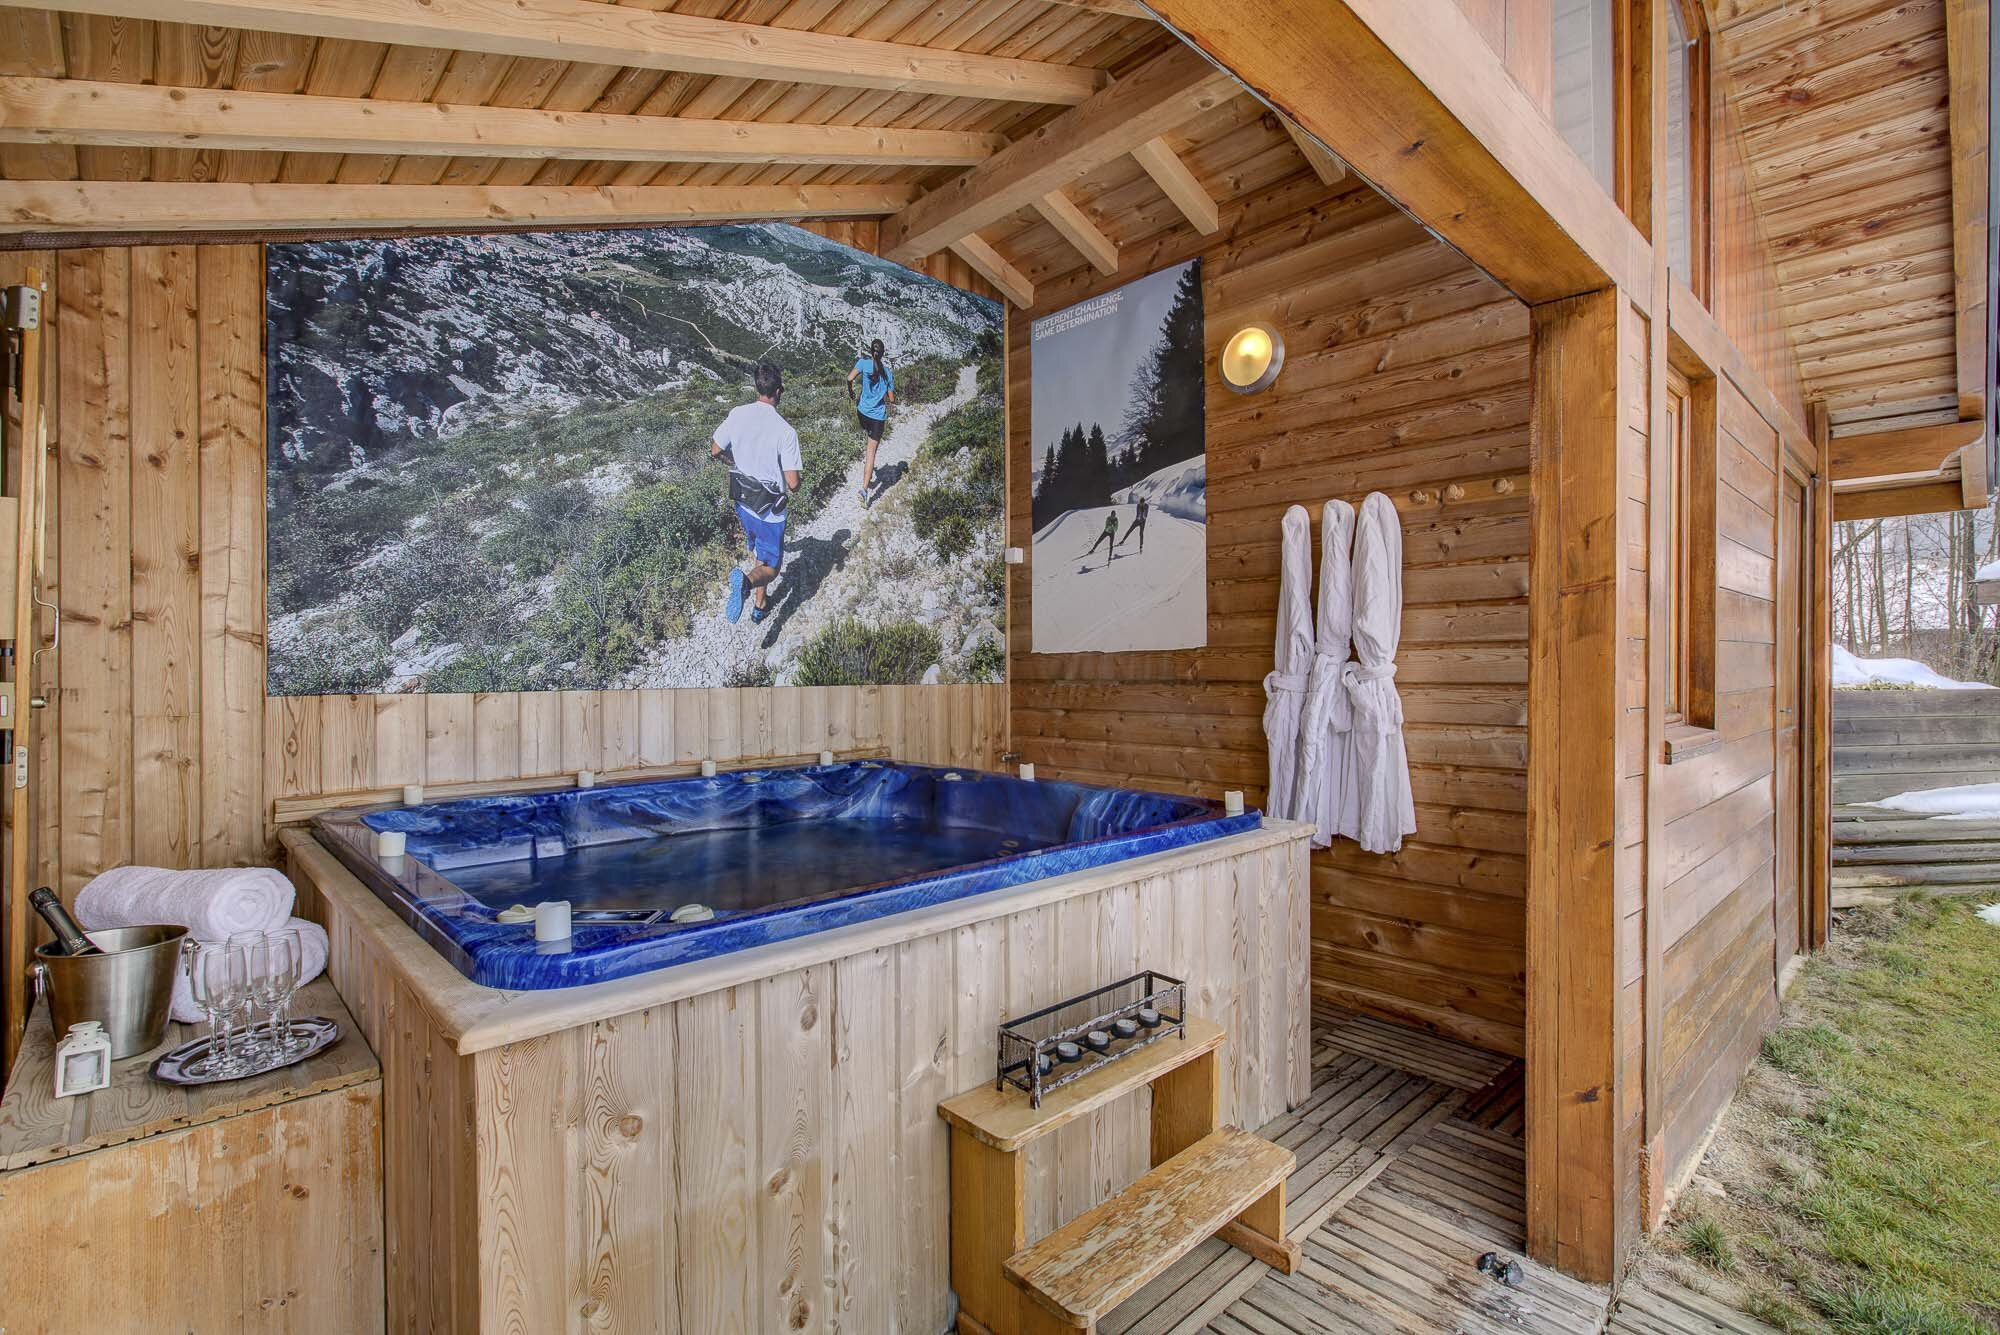 tg-ski-chalet-le-roc-soleil-morzine-015.jpg